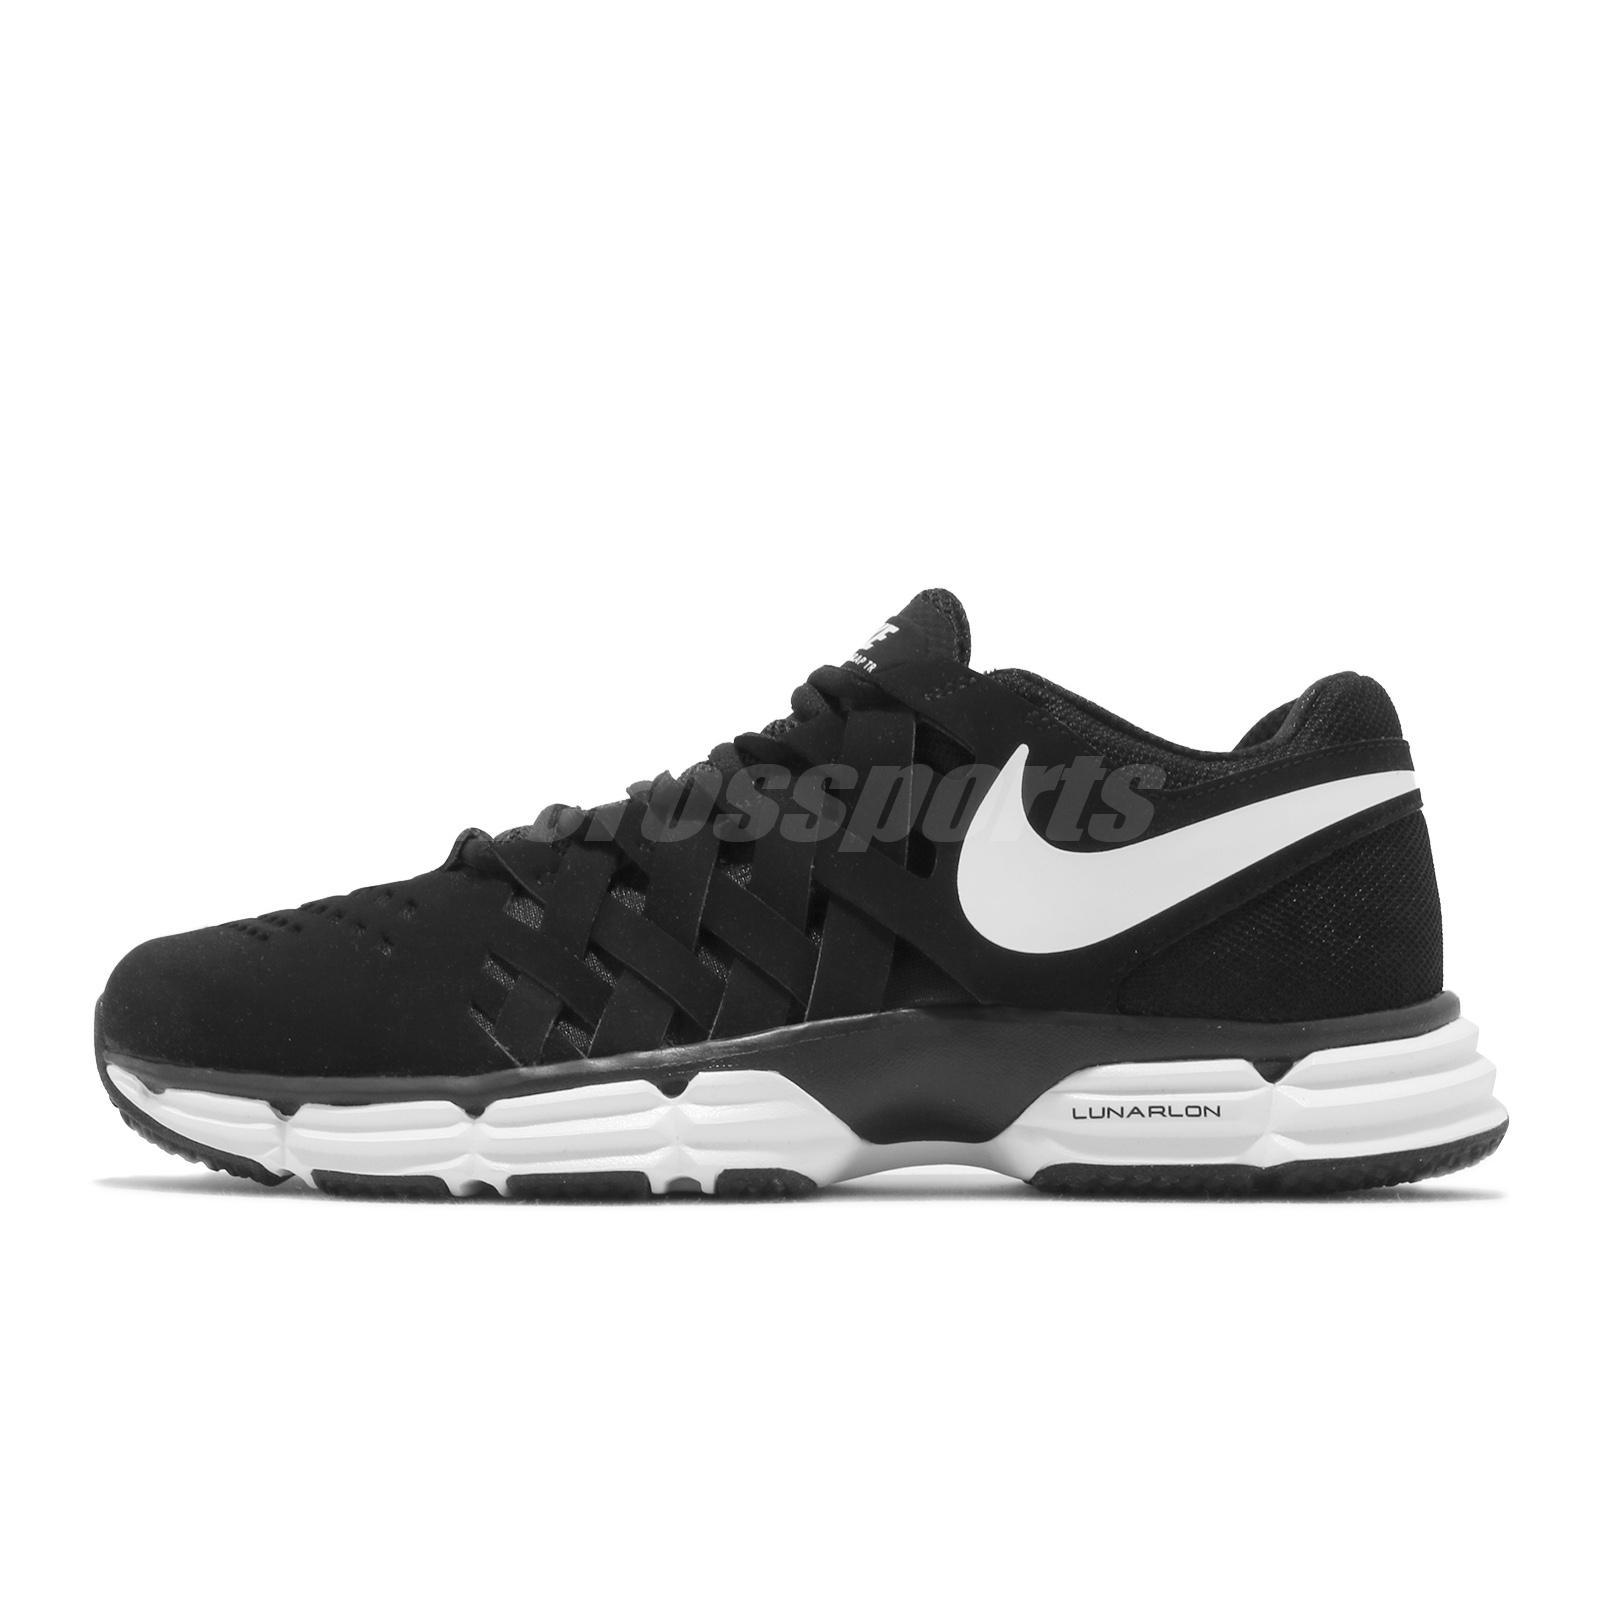 37c7ebe9b6c9b6 Details about Nike Lunar Fingertrap TR Cross Training Mens Shoes Black  White NWOB 898066-001